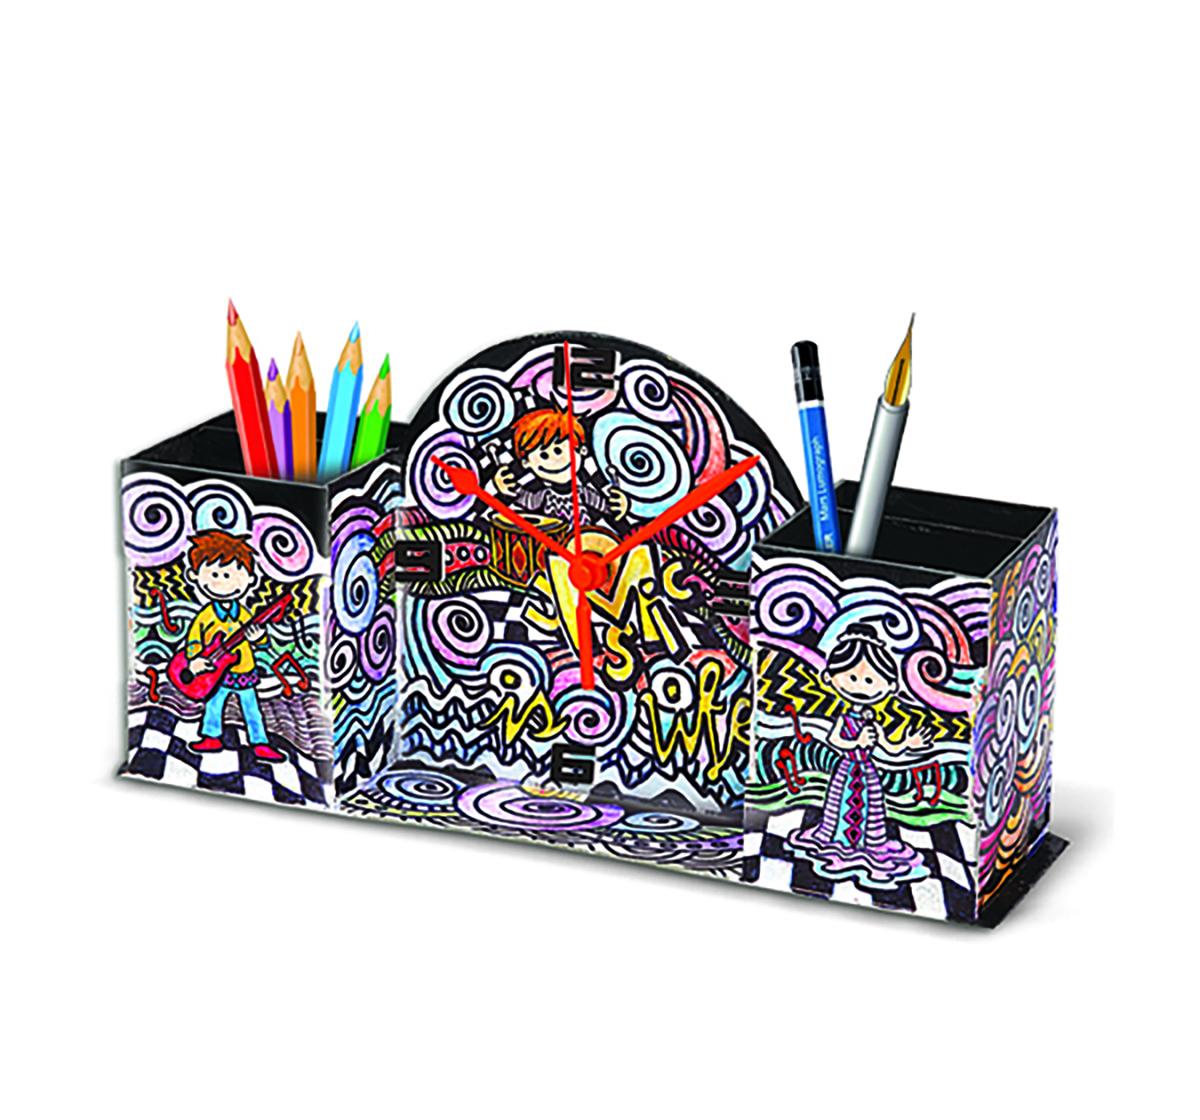 Toy Kraft | Toy Kraft The Big Hobby Box DIY Art & Craft Kits for Kids age 8Y+